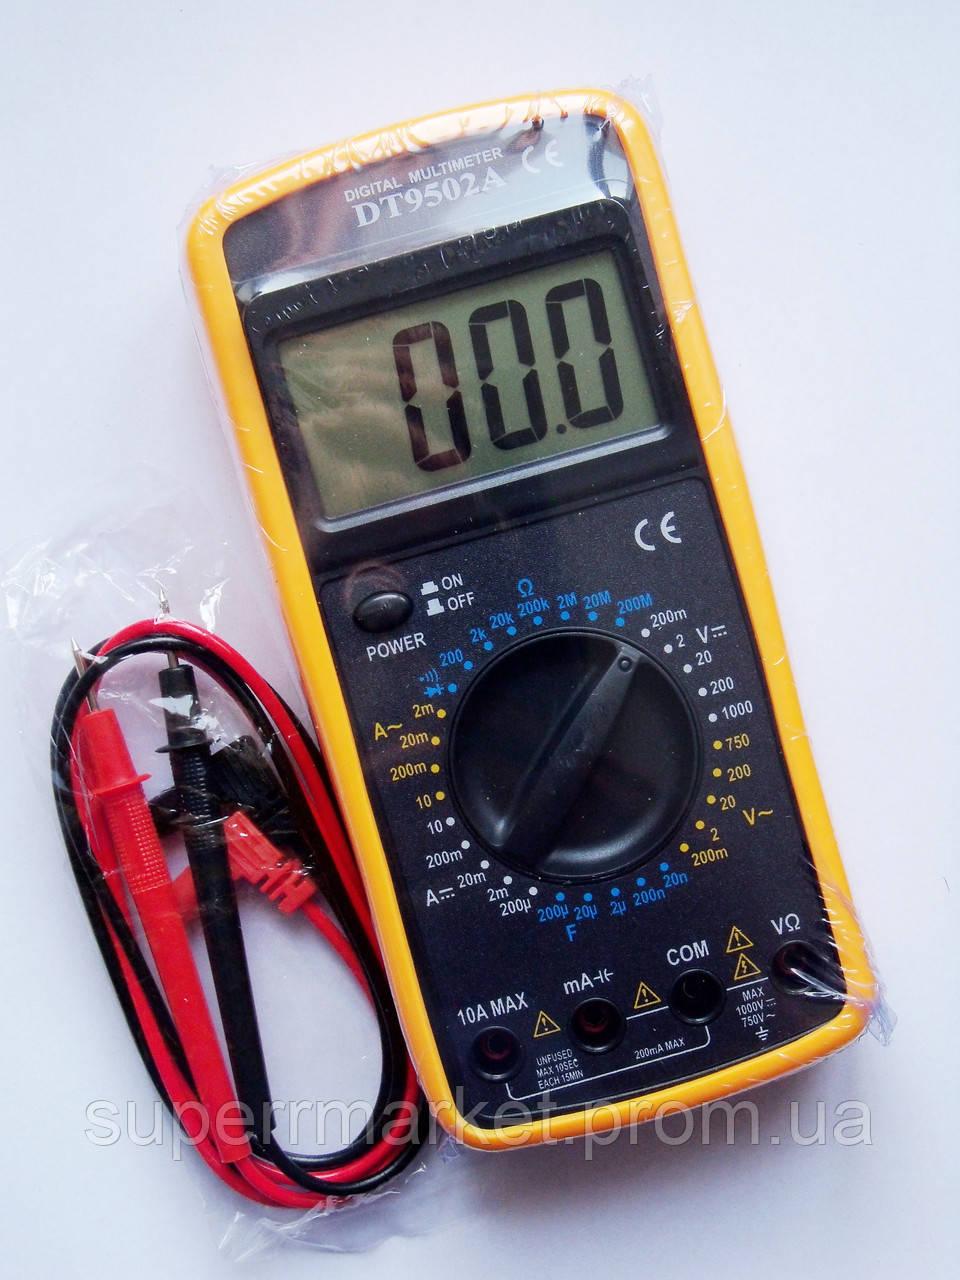 Цифровой мультиметр Тестер DT-9502A